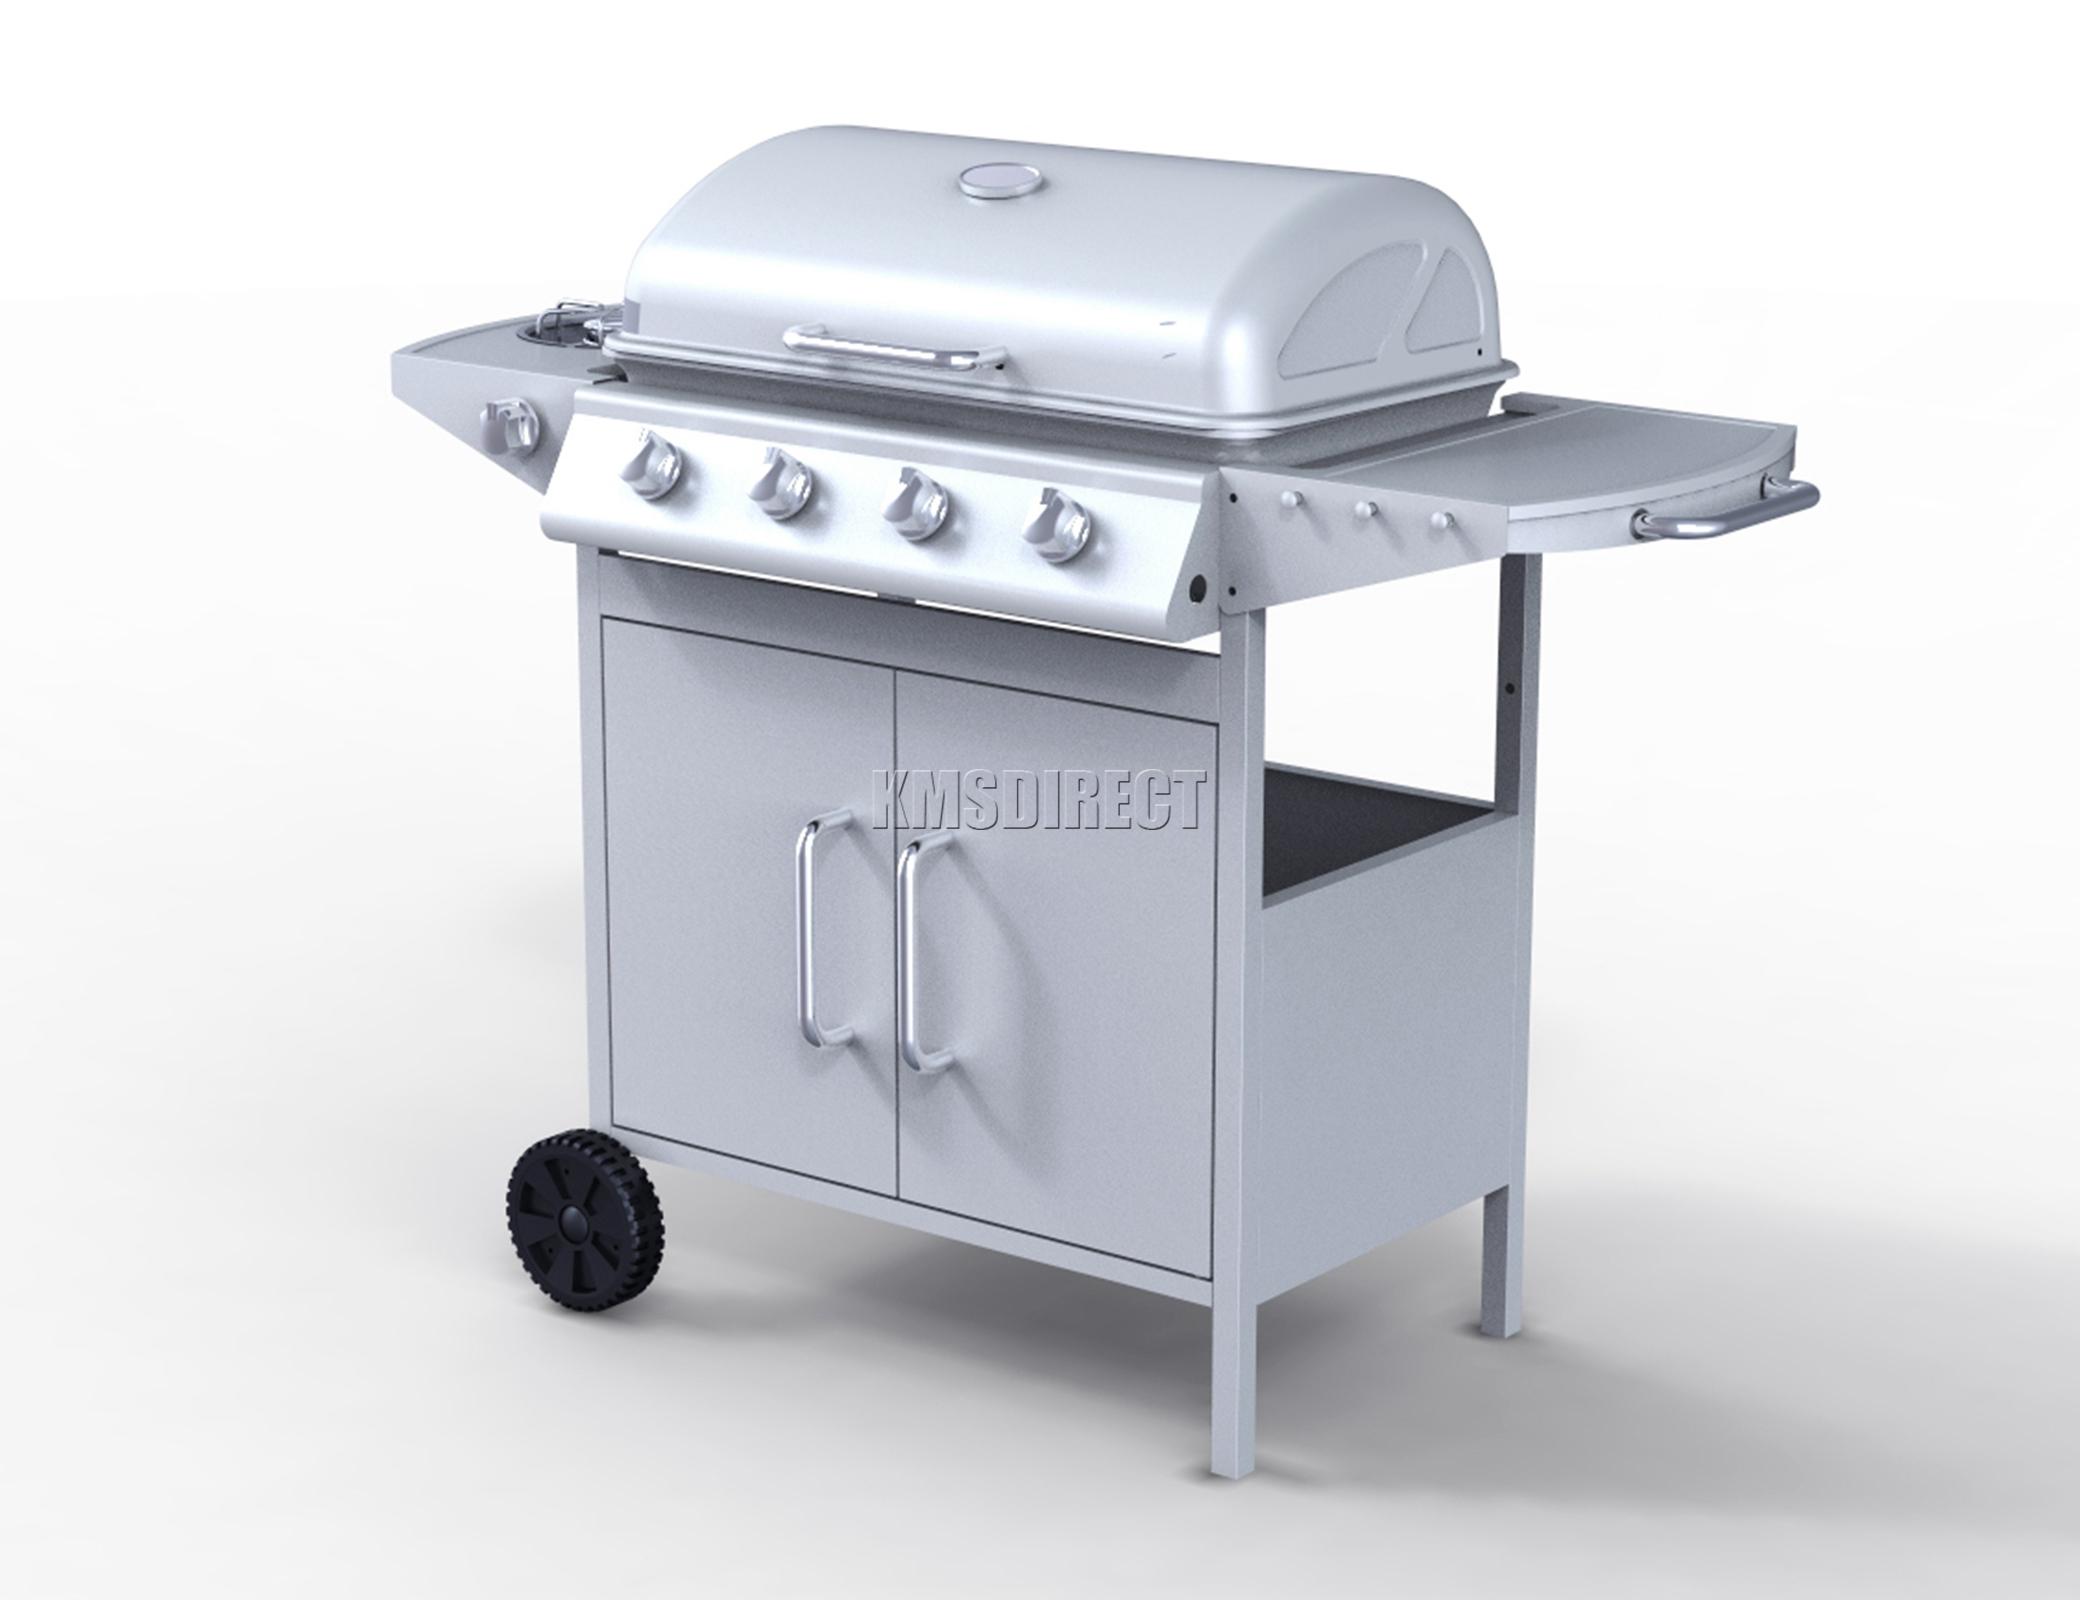 foxhunter 4 burner bbq gas grill silver steel barbecue 1 side garden g2087d ebay. Black Bedroom Furniture Sets. Home Design Ideas